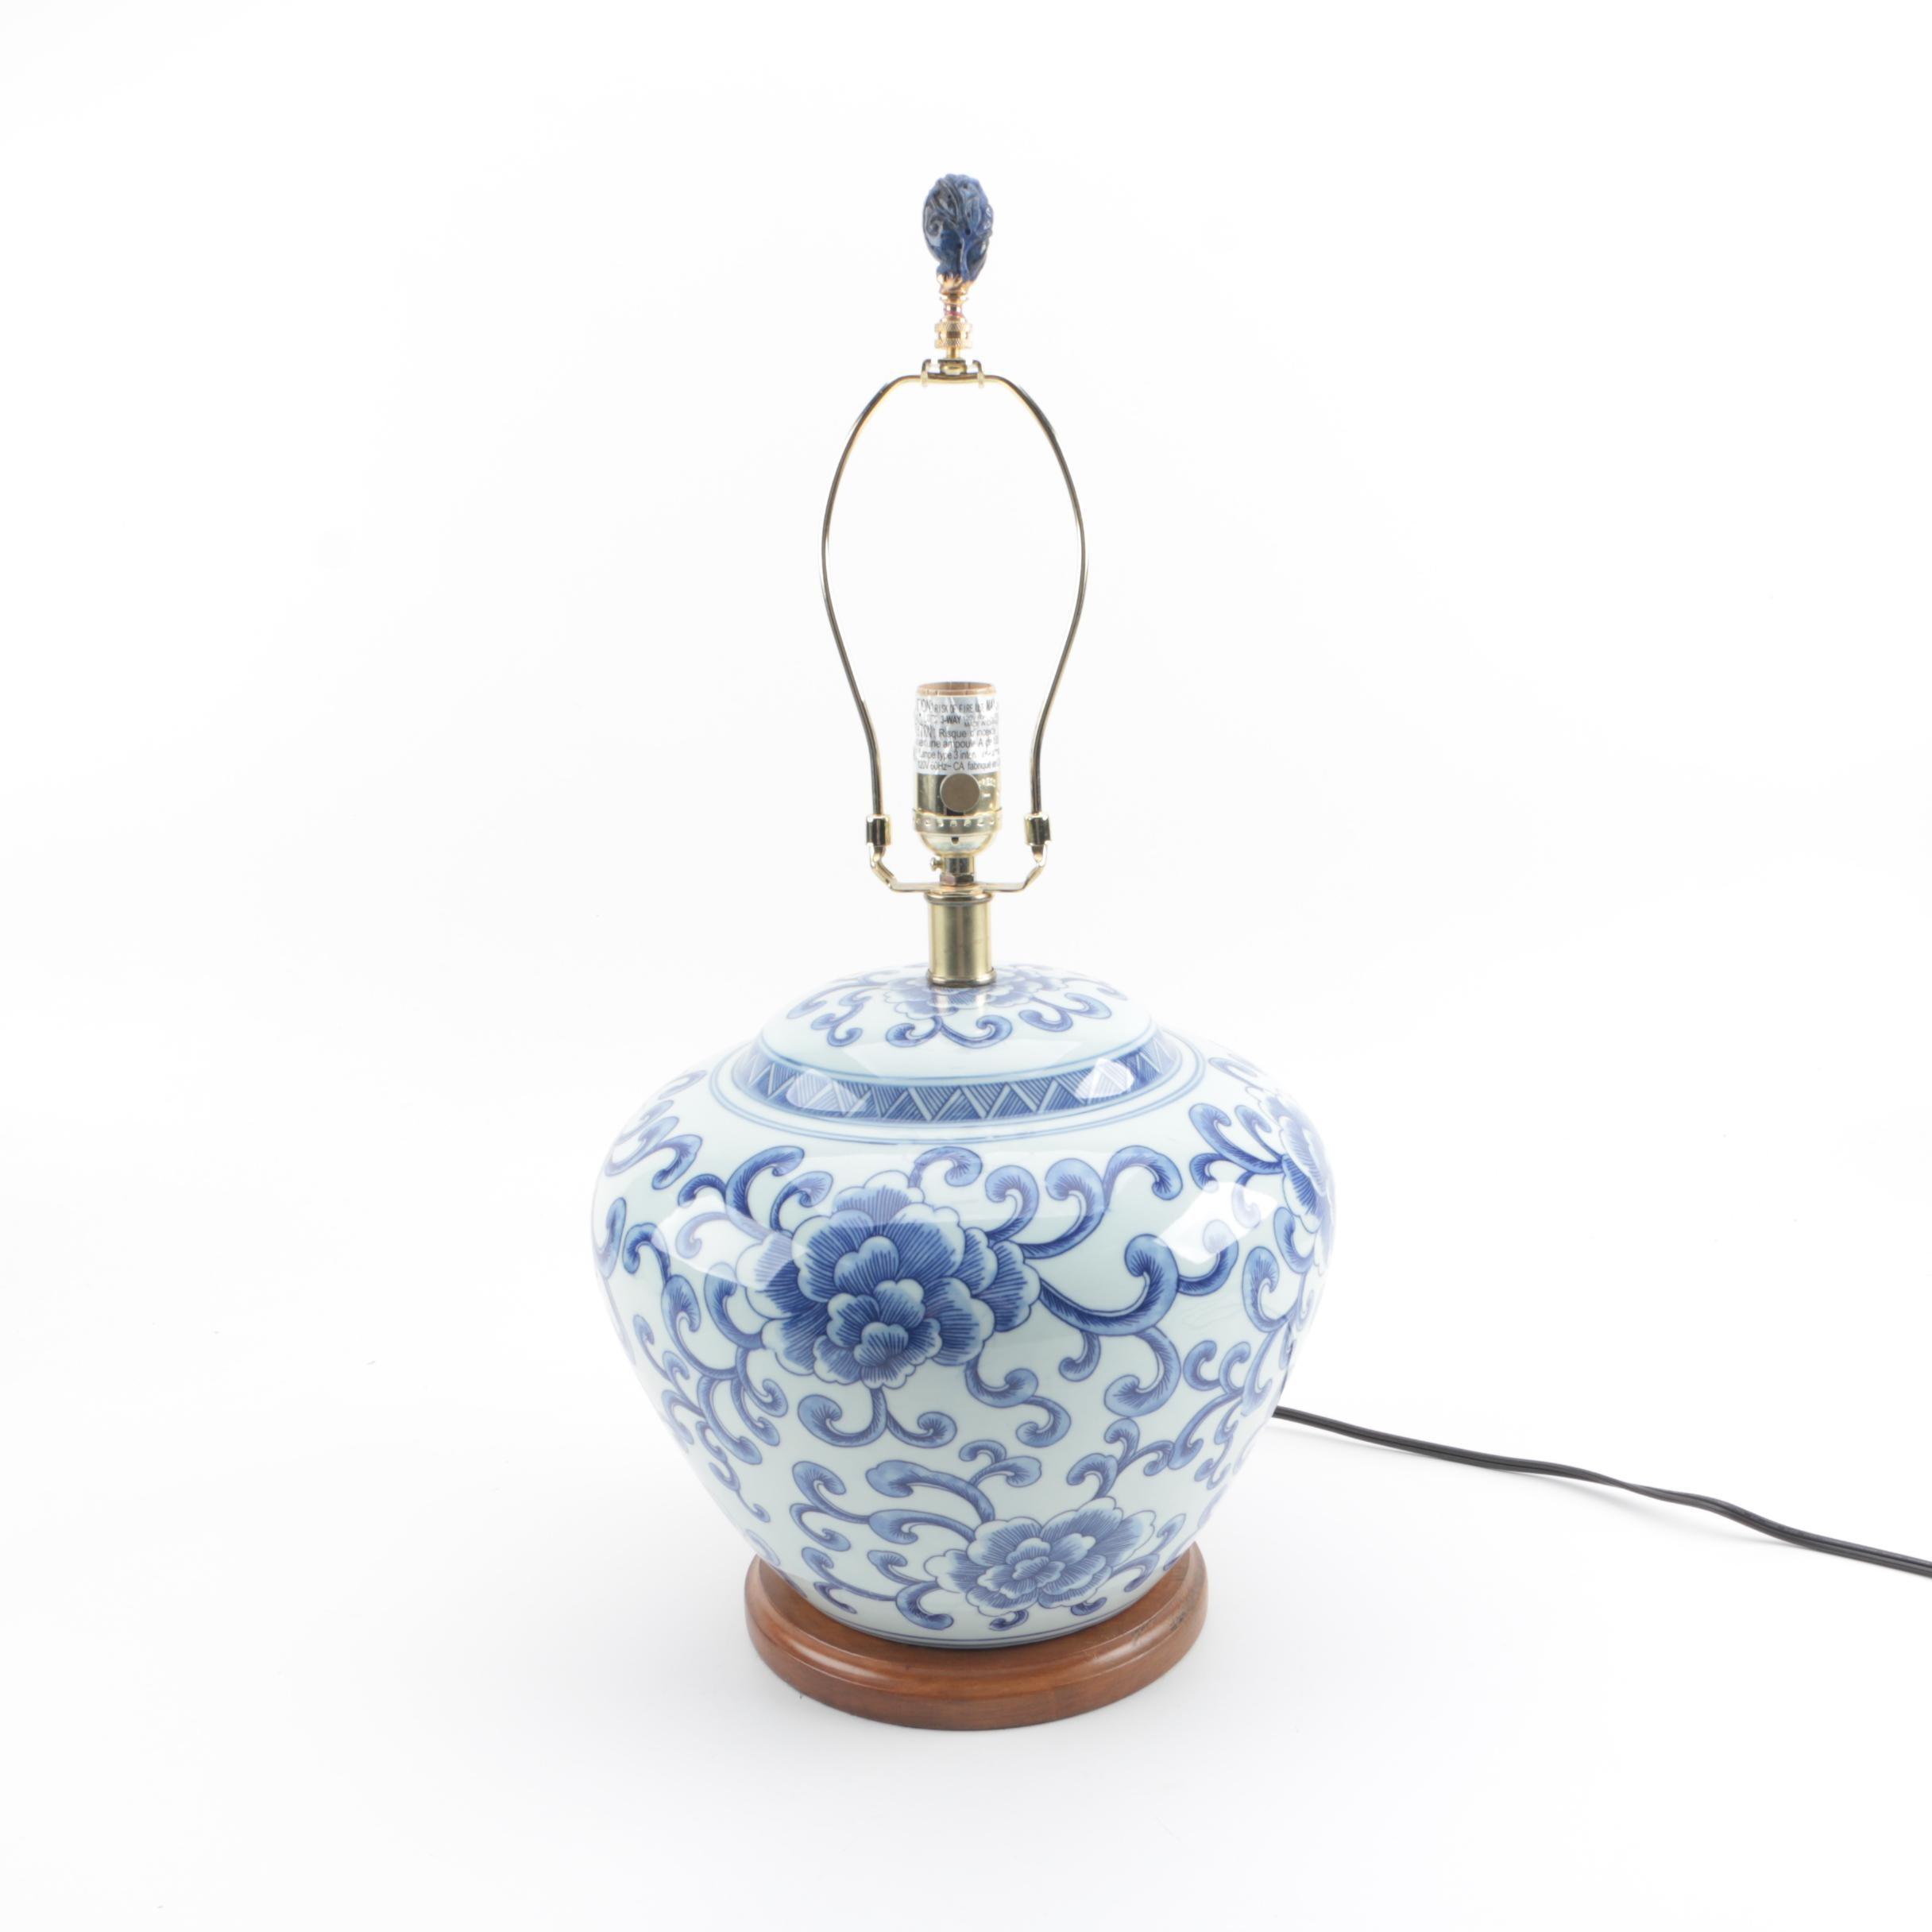 Ralph Lauren Blue and White Lotus Ginger Jar Porcelain Lamp